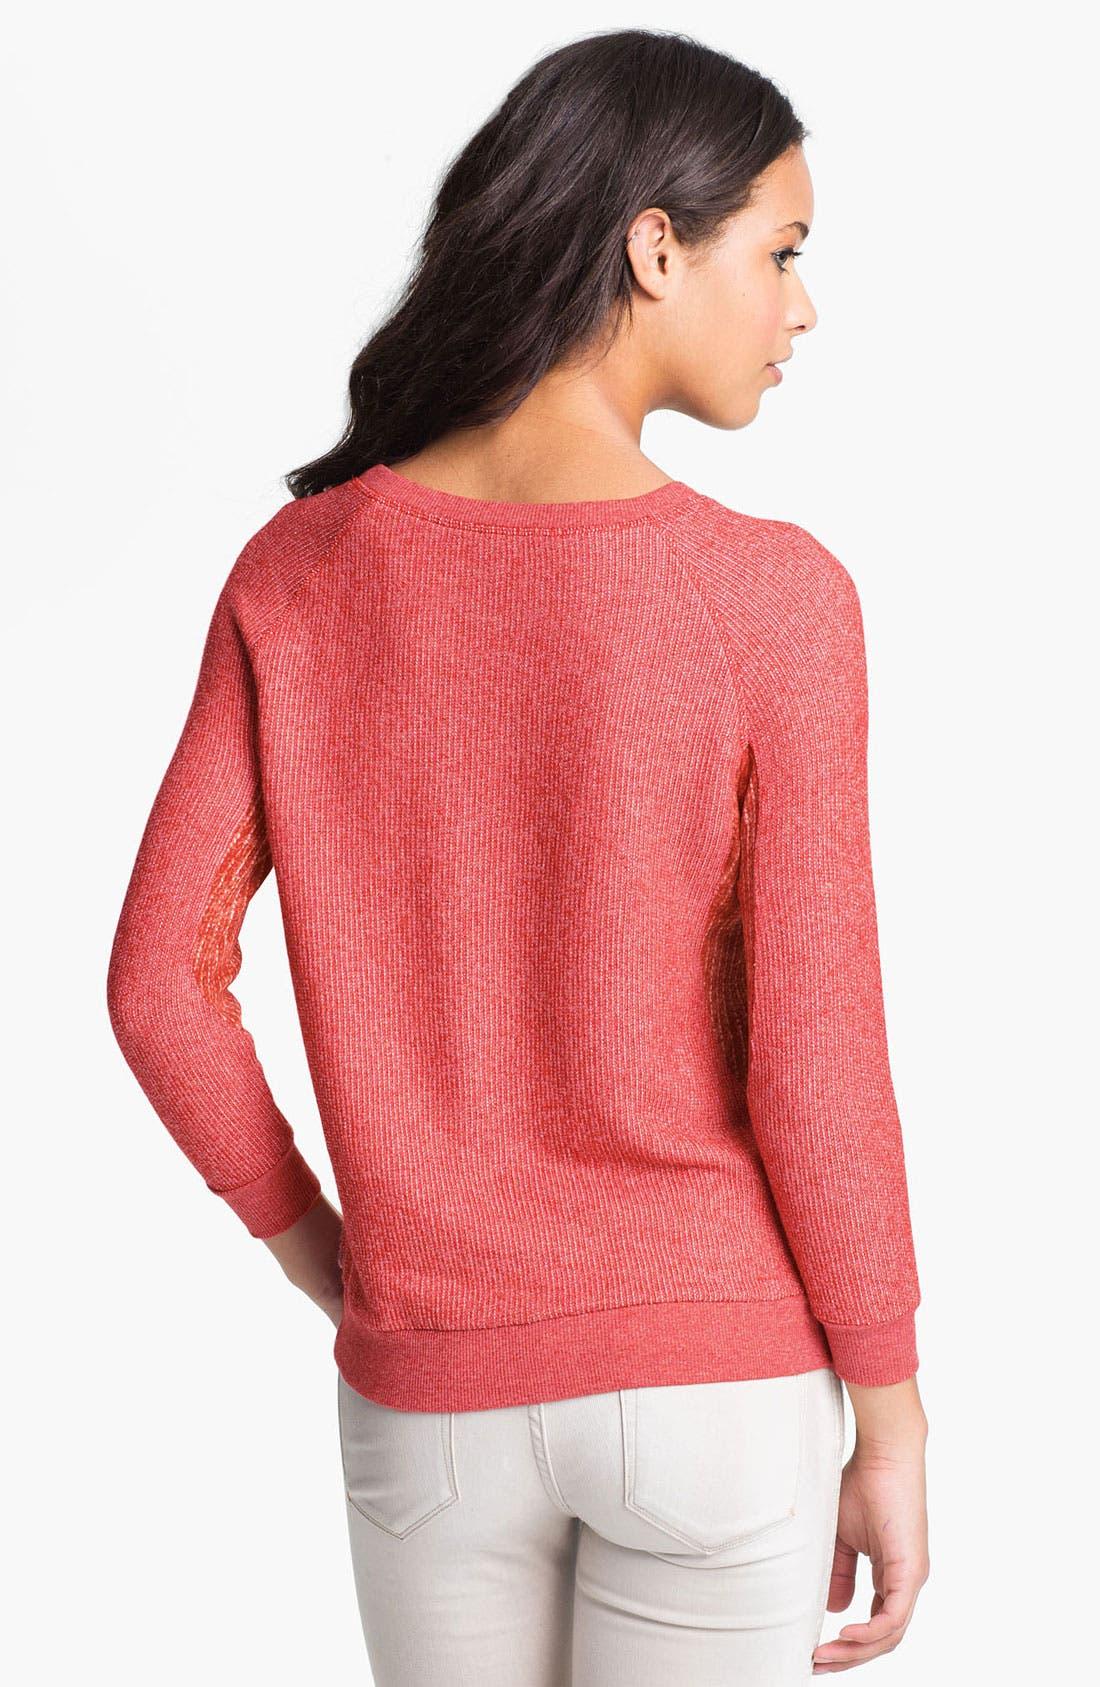 Alternate Image 2  - MARC BY MARC JACOBS 'Win' Mixed Media Sweatshirt